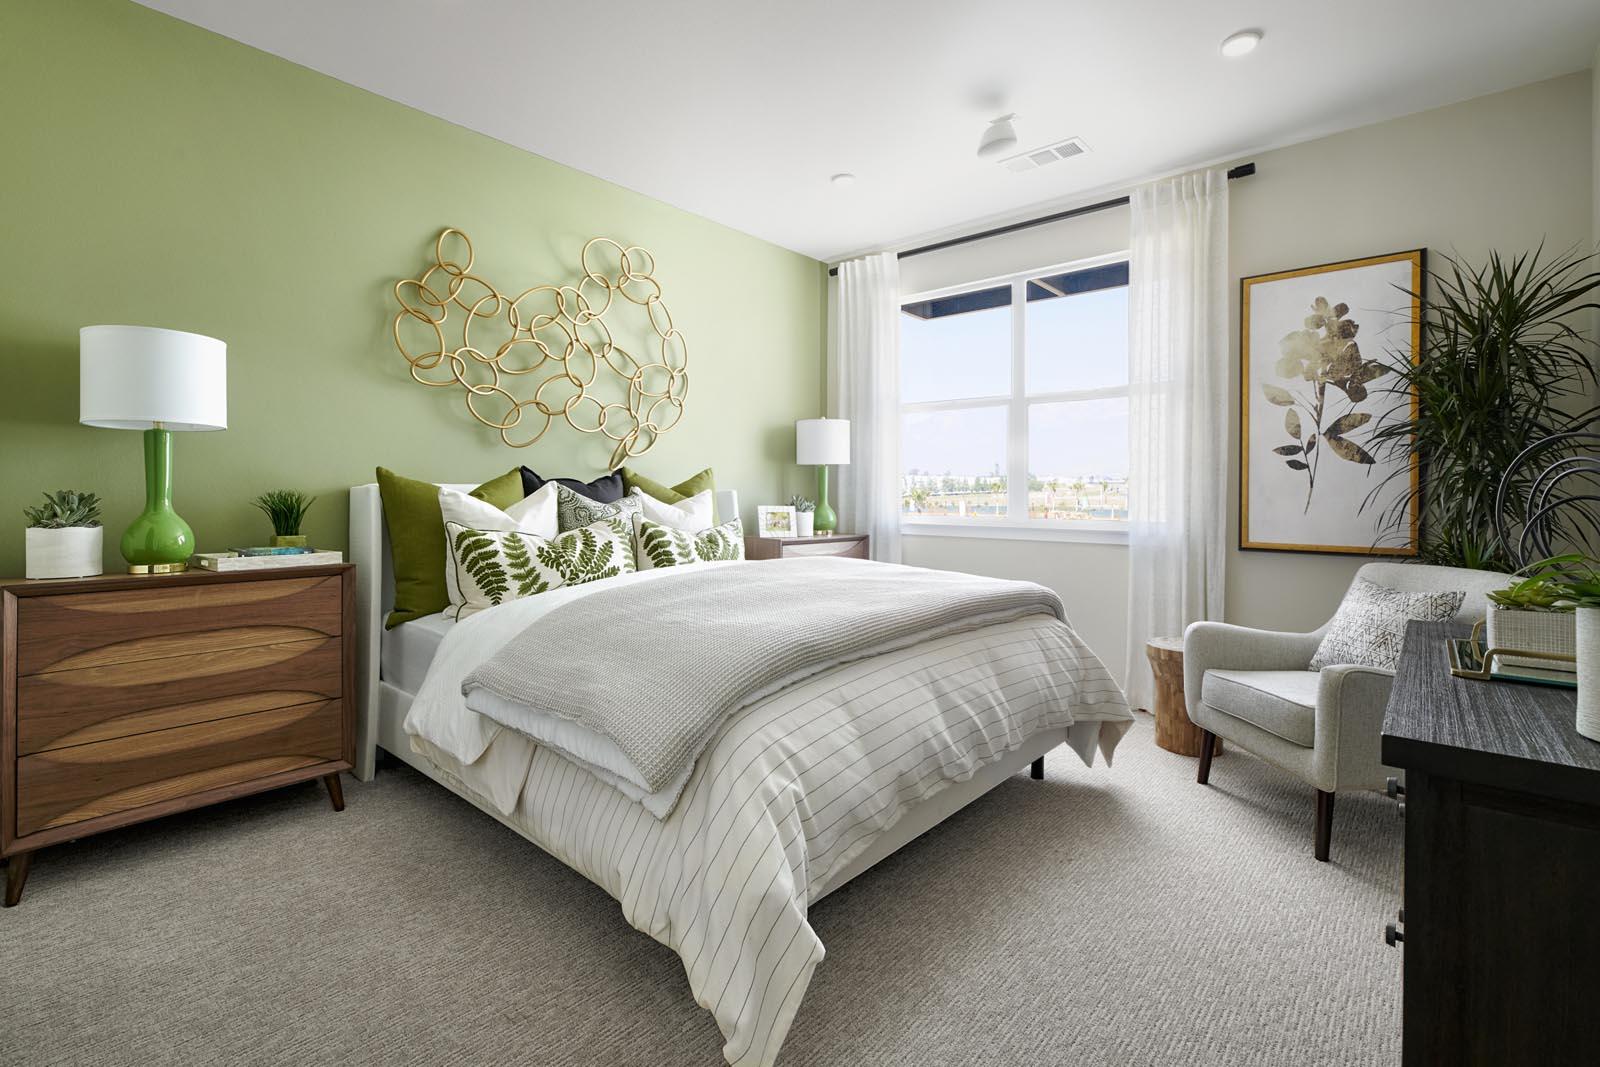 Master Bedroom | Residence 3 | Enliven | New Homes in Rancho Cucamonga, CA | Van Daele Homes